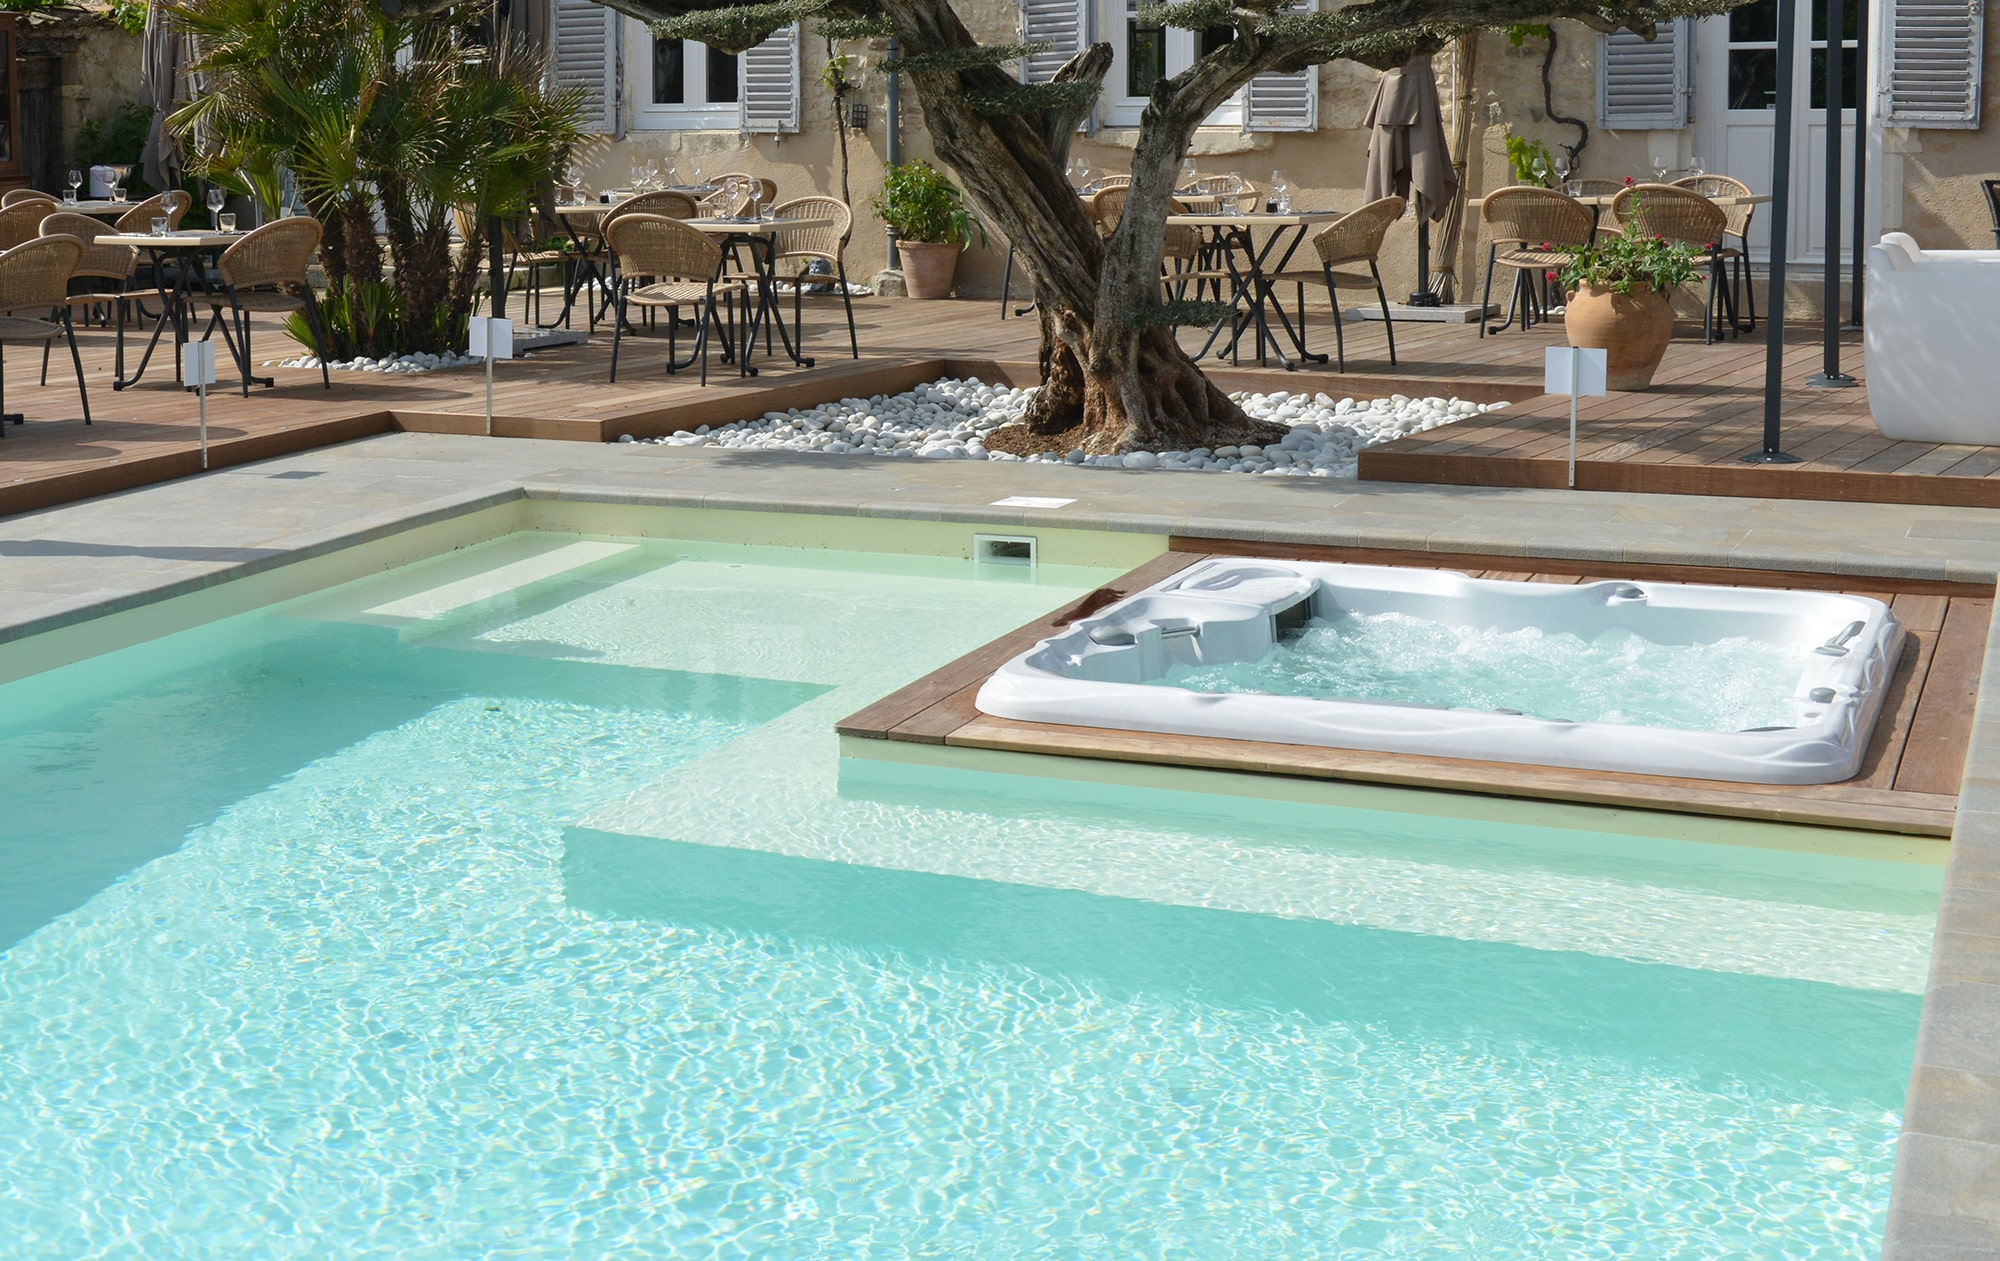 Sundance Spas installation with pool